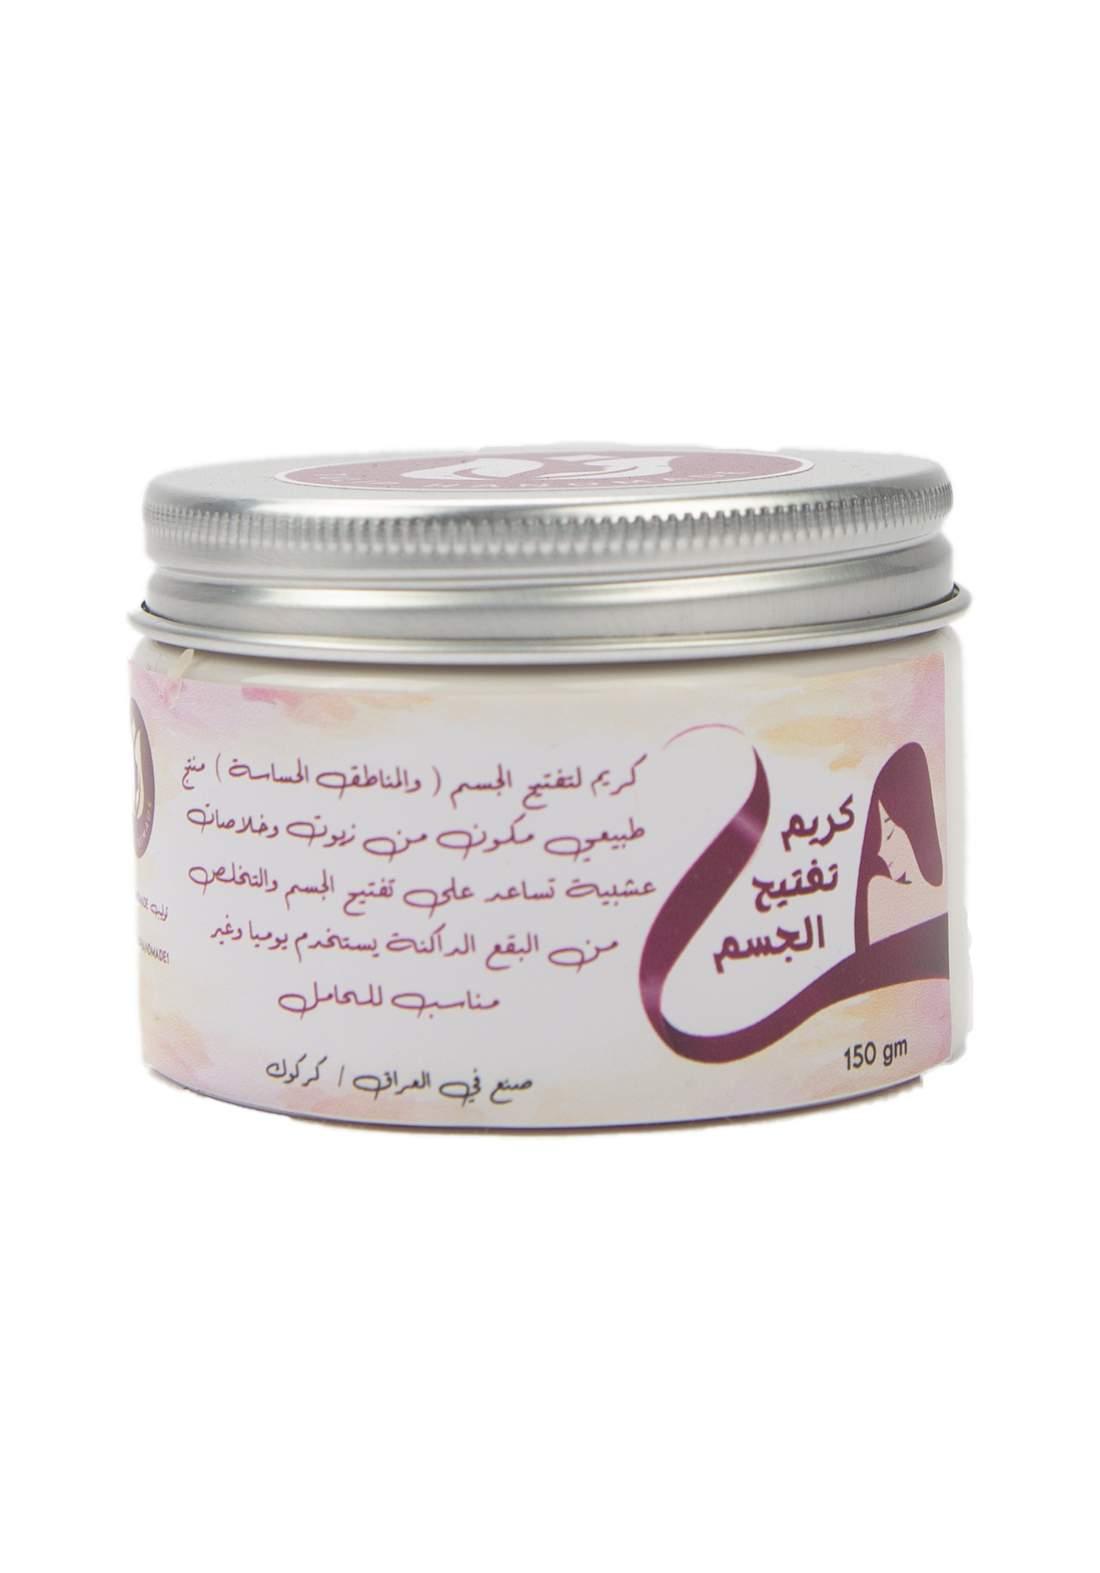 Tulip Body Whitening Cream 150 G كريم تفتيح الجسم